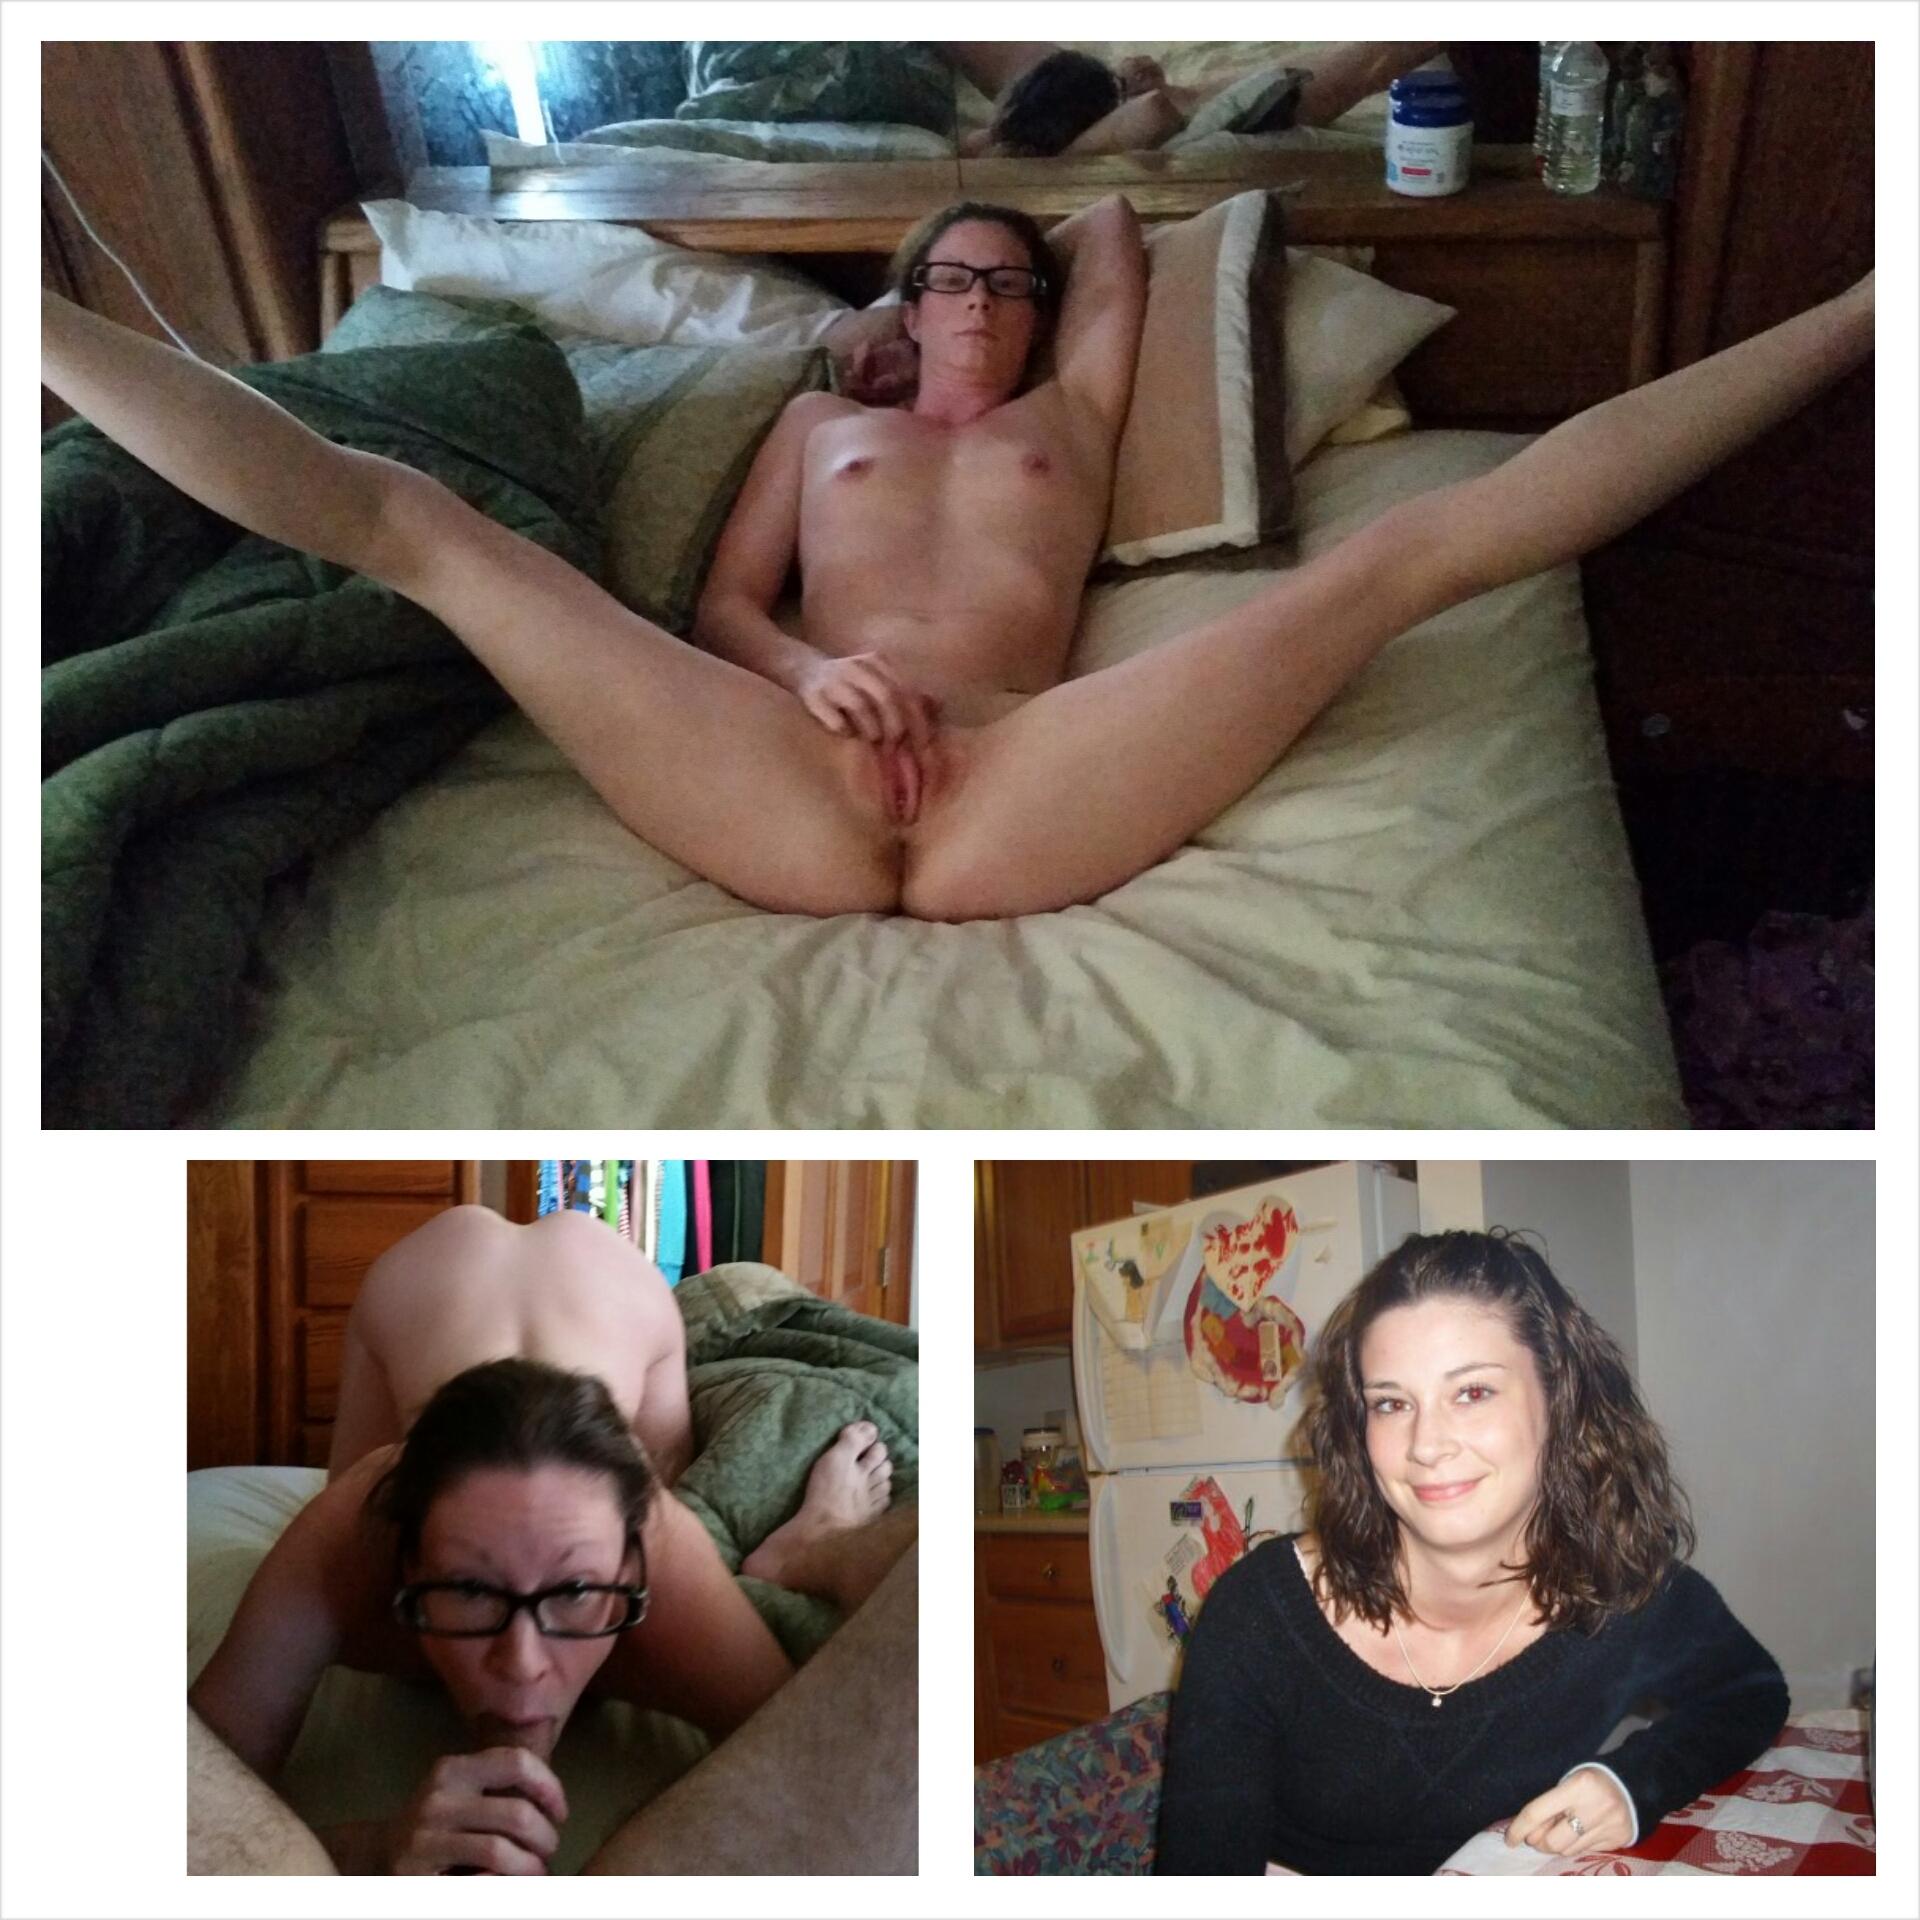 Tori black having stockings sex